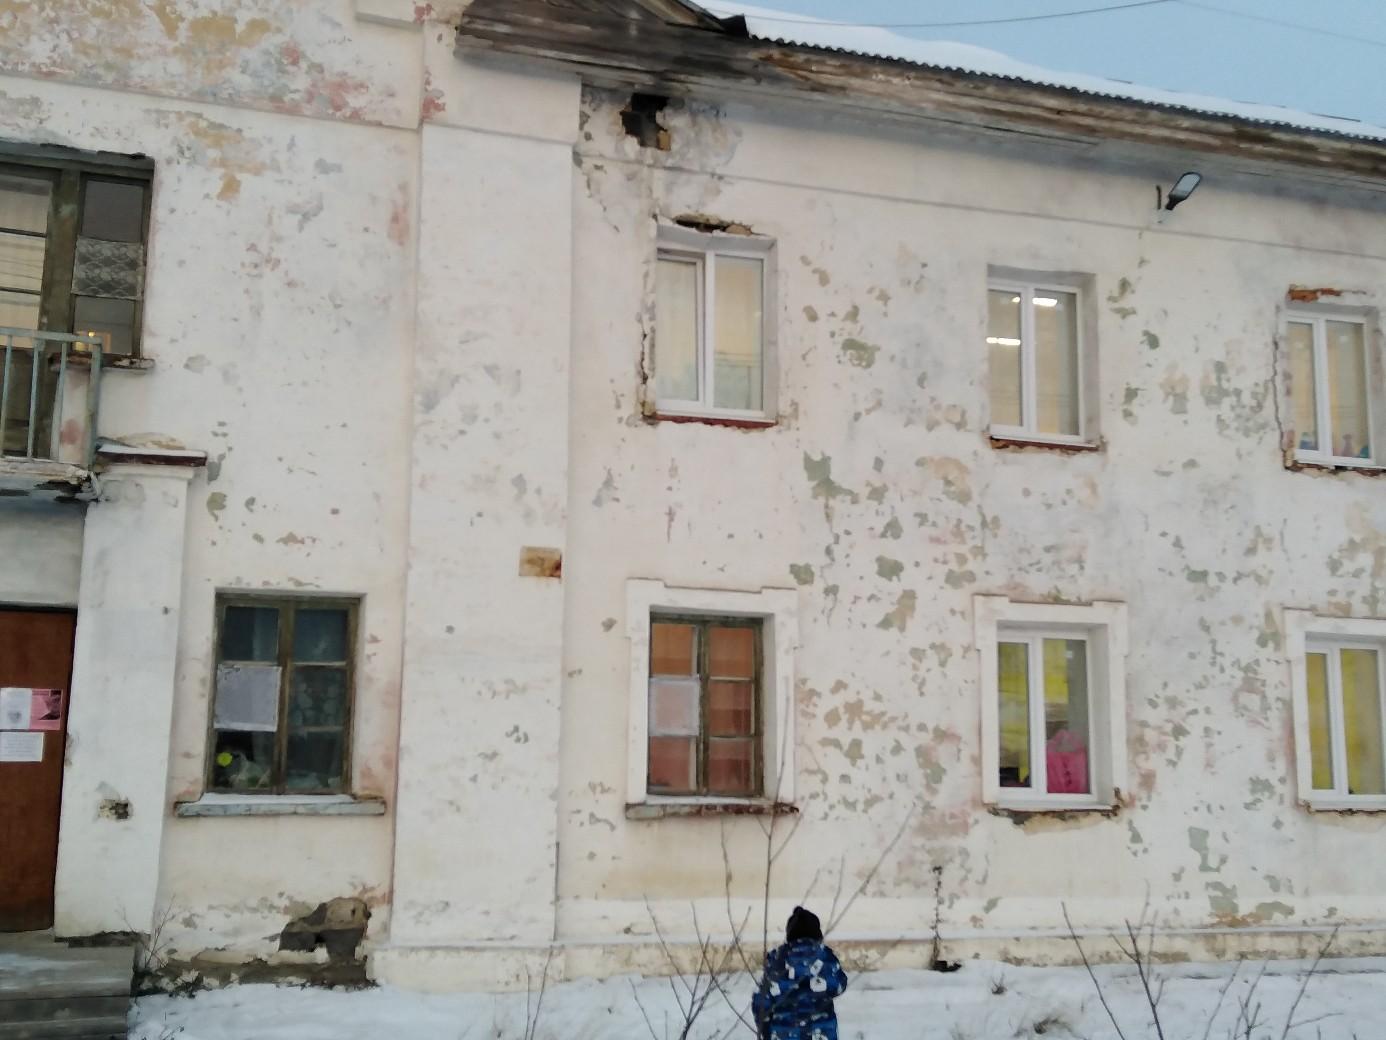 Зданиефельдшерско-акушерского пункта